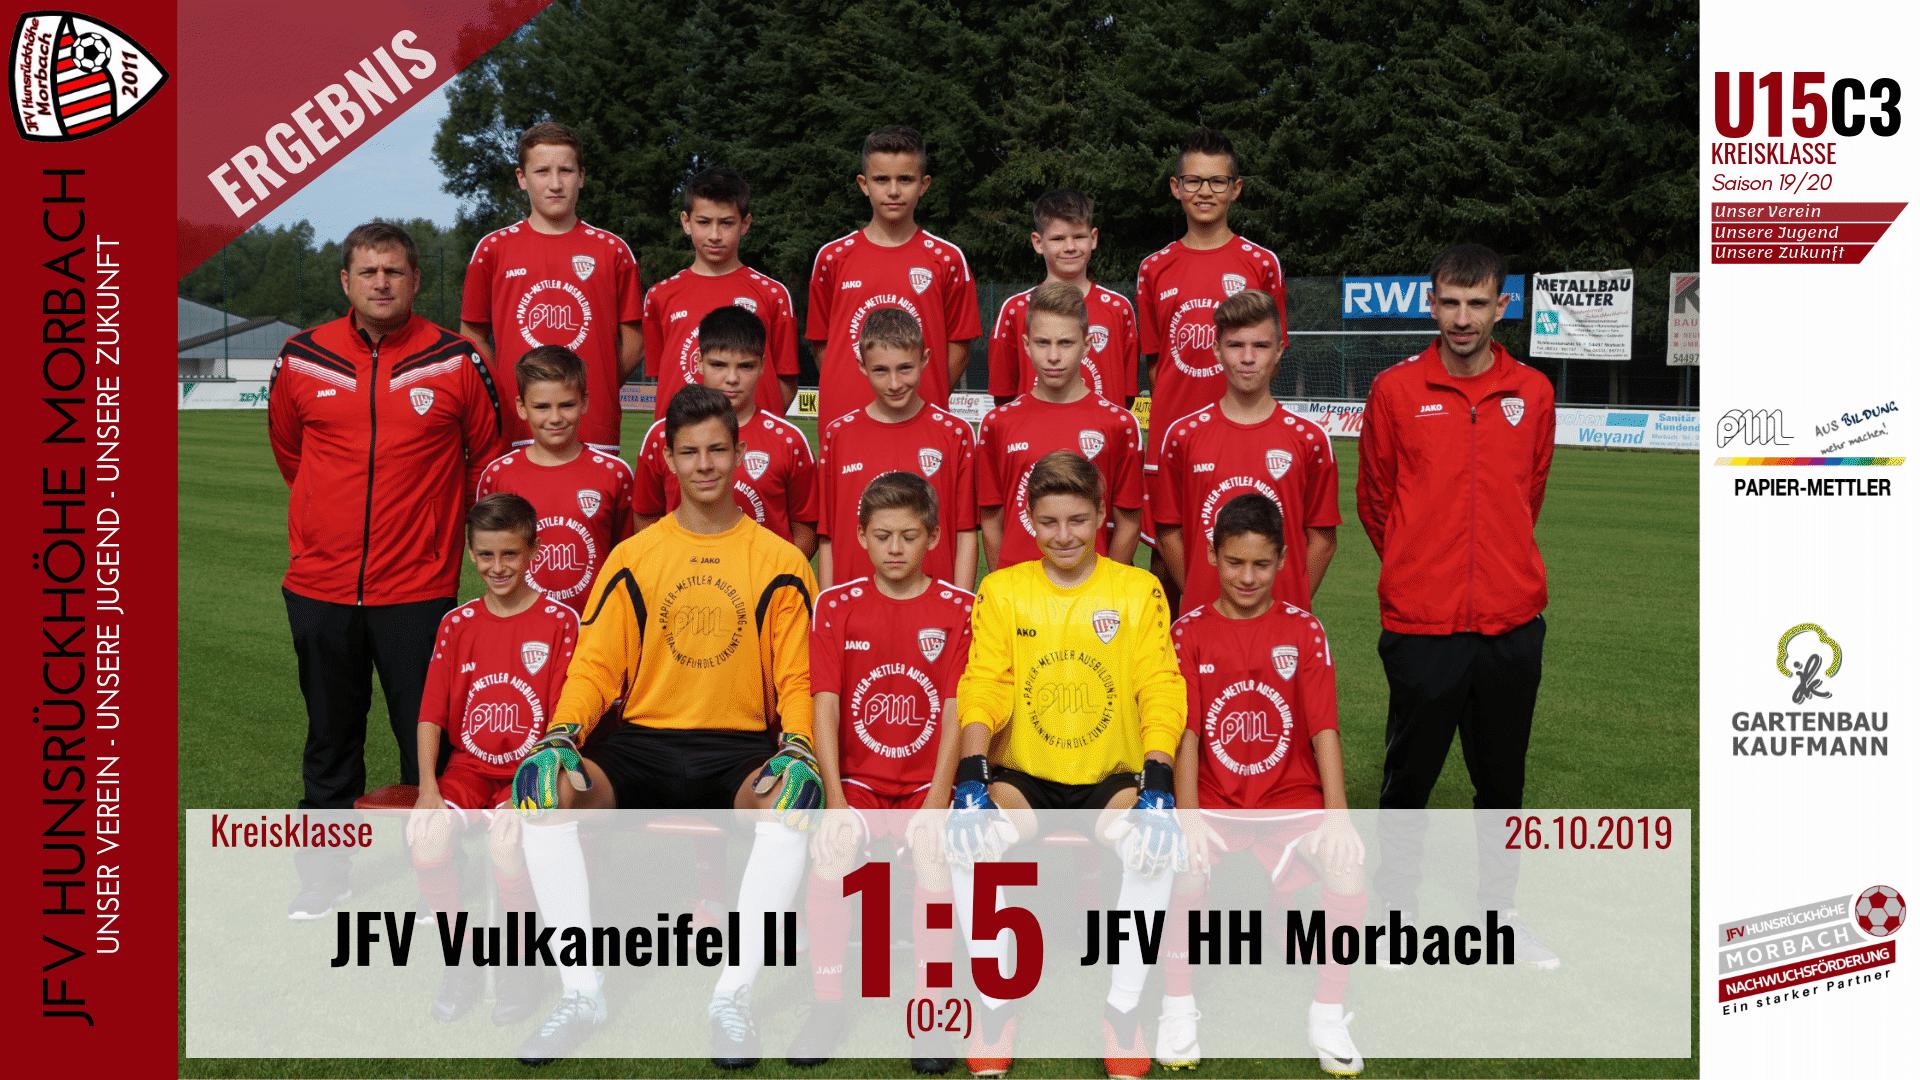 U15 C3: JFV Vulkaneifel II – JFV Hunsrückhöhe Morbach 1:5 (0:2)